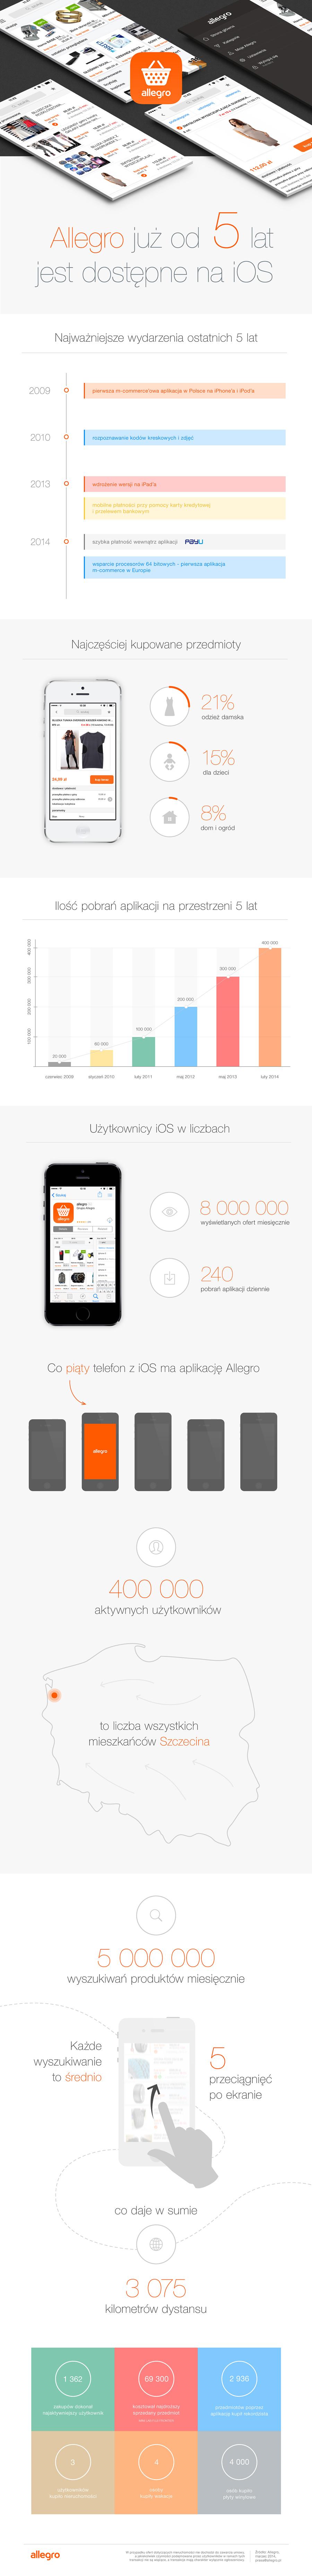 5 lat aplikacji Allegro iOS